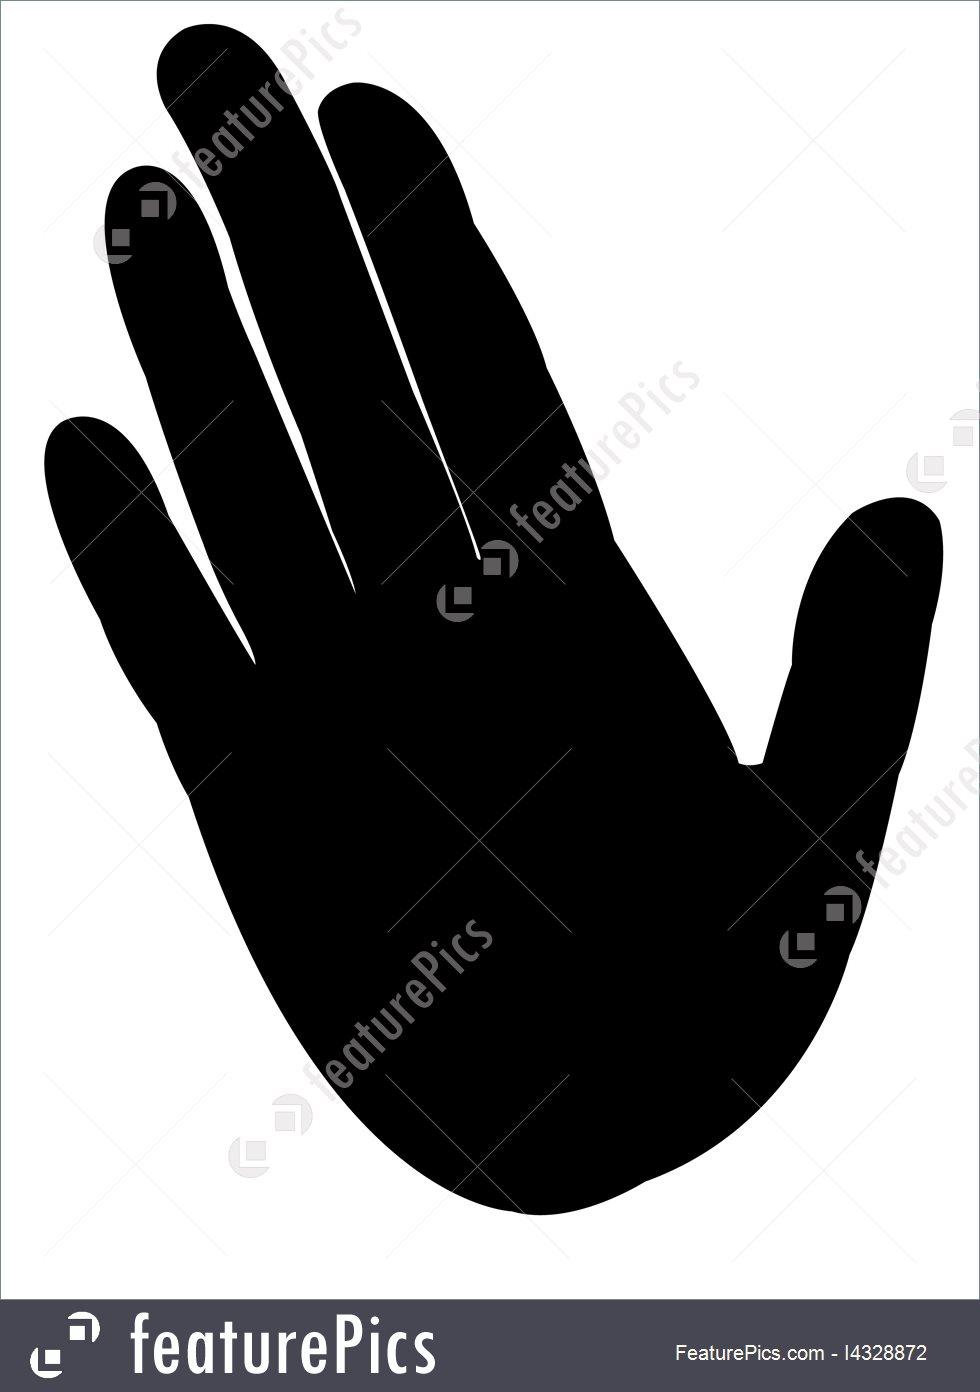 980x1392 Woman Hand Silhouette Vector Stock Illustration I4328872